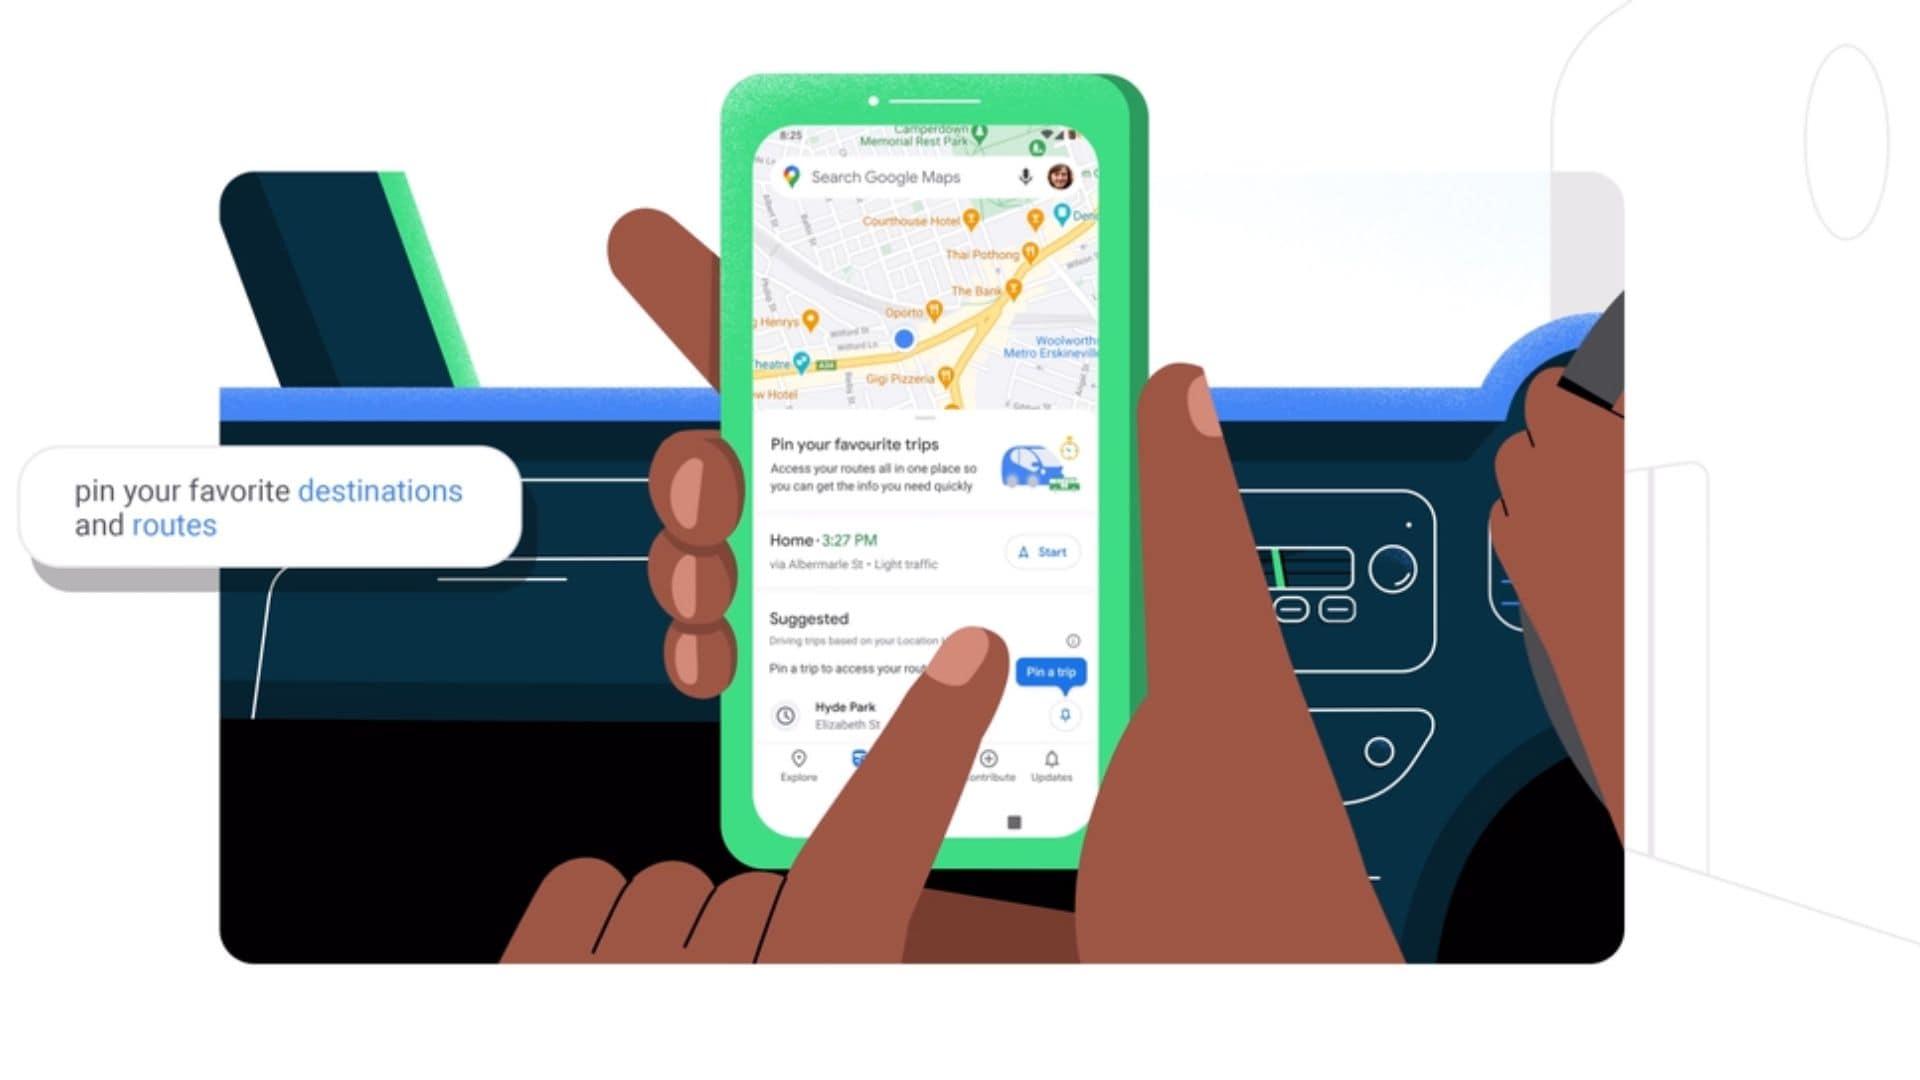 Go Tab in Google Maps